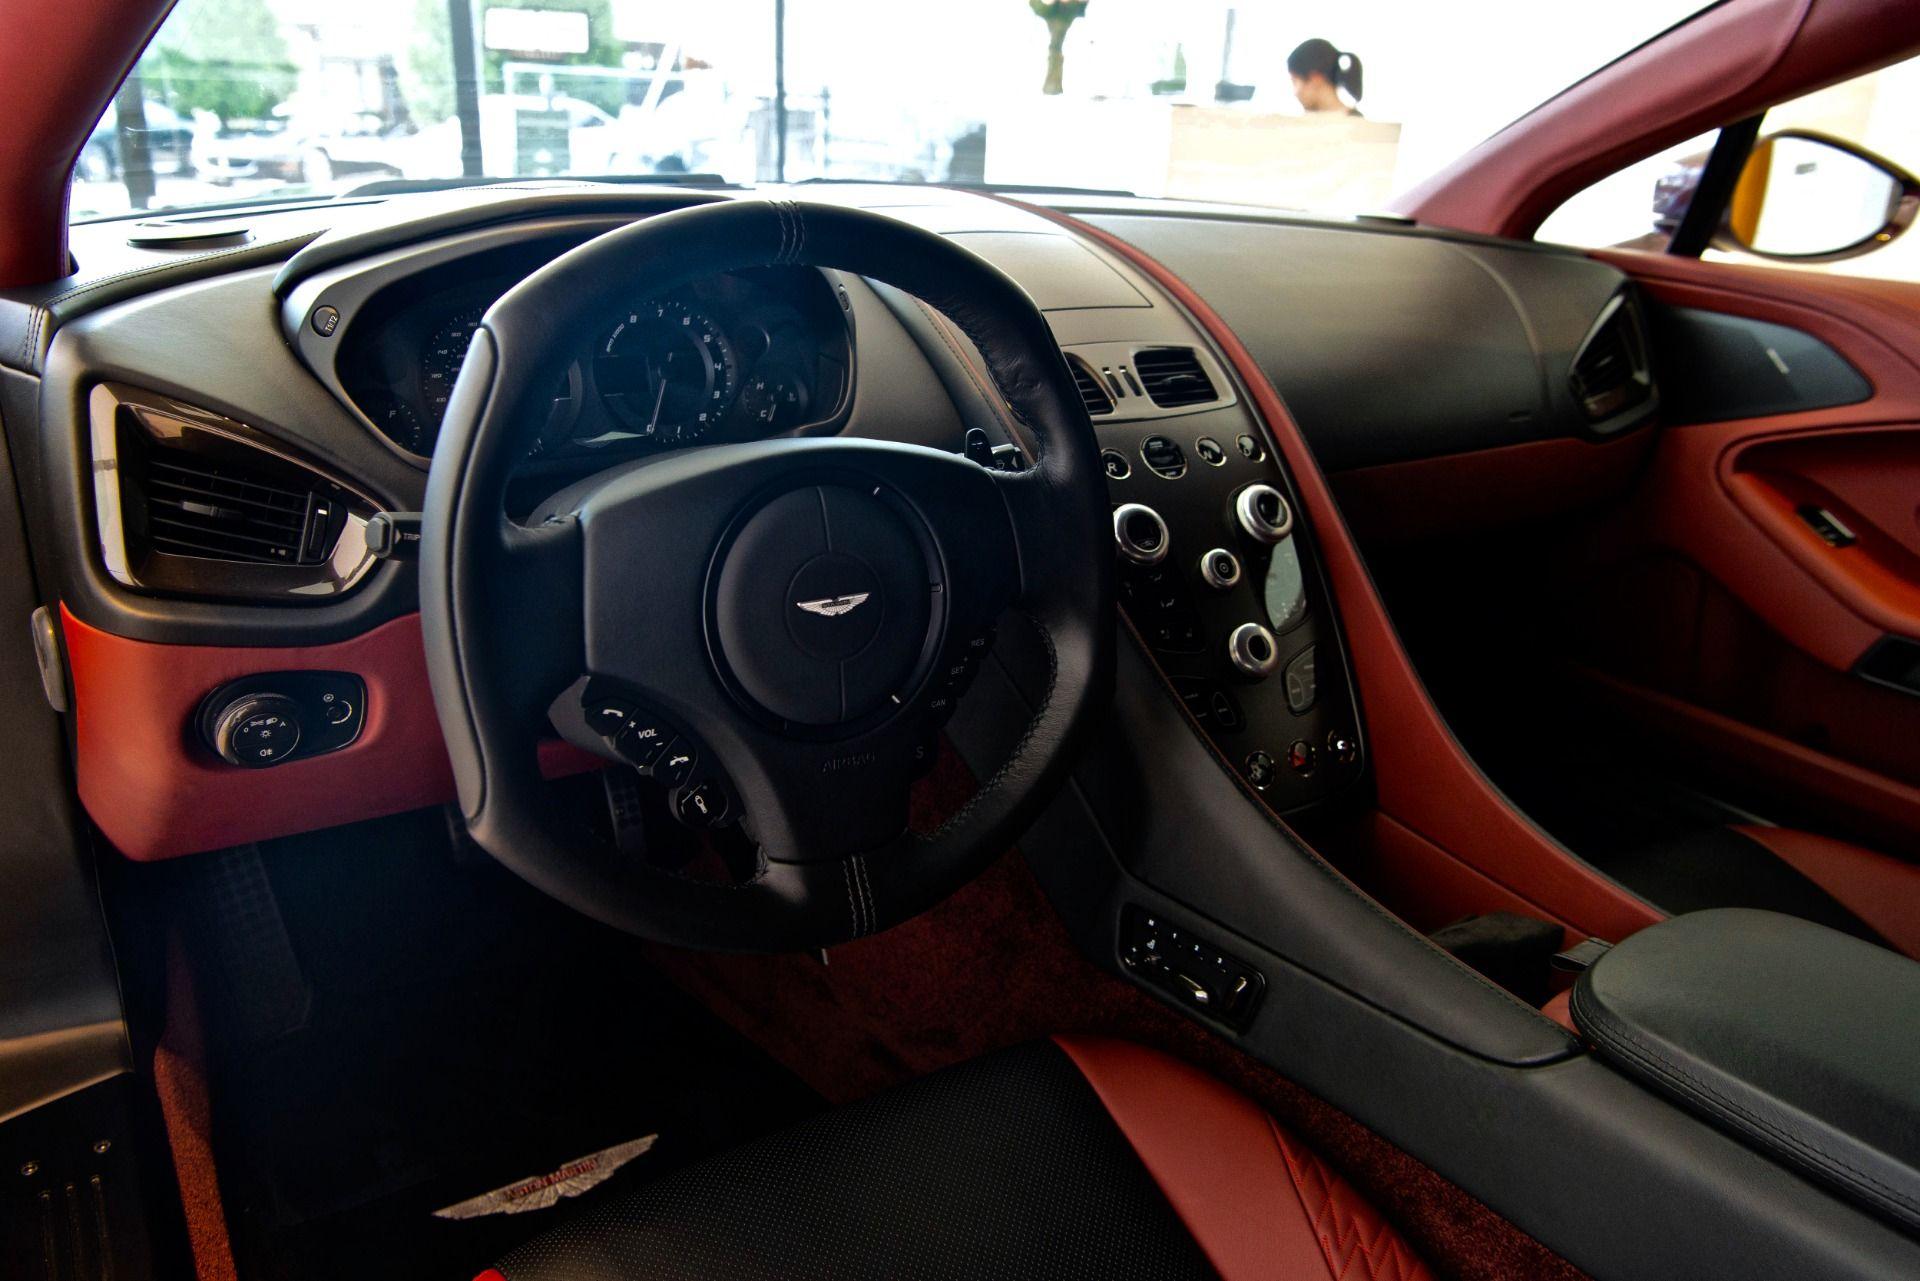 2018 Aston Martin Vanquish Zagato In 2020 Aston Martin Vanquish Aston Martin Vanquish